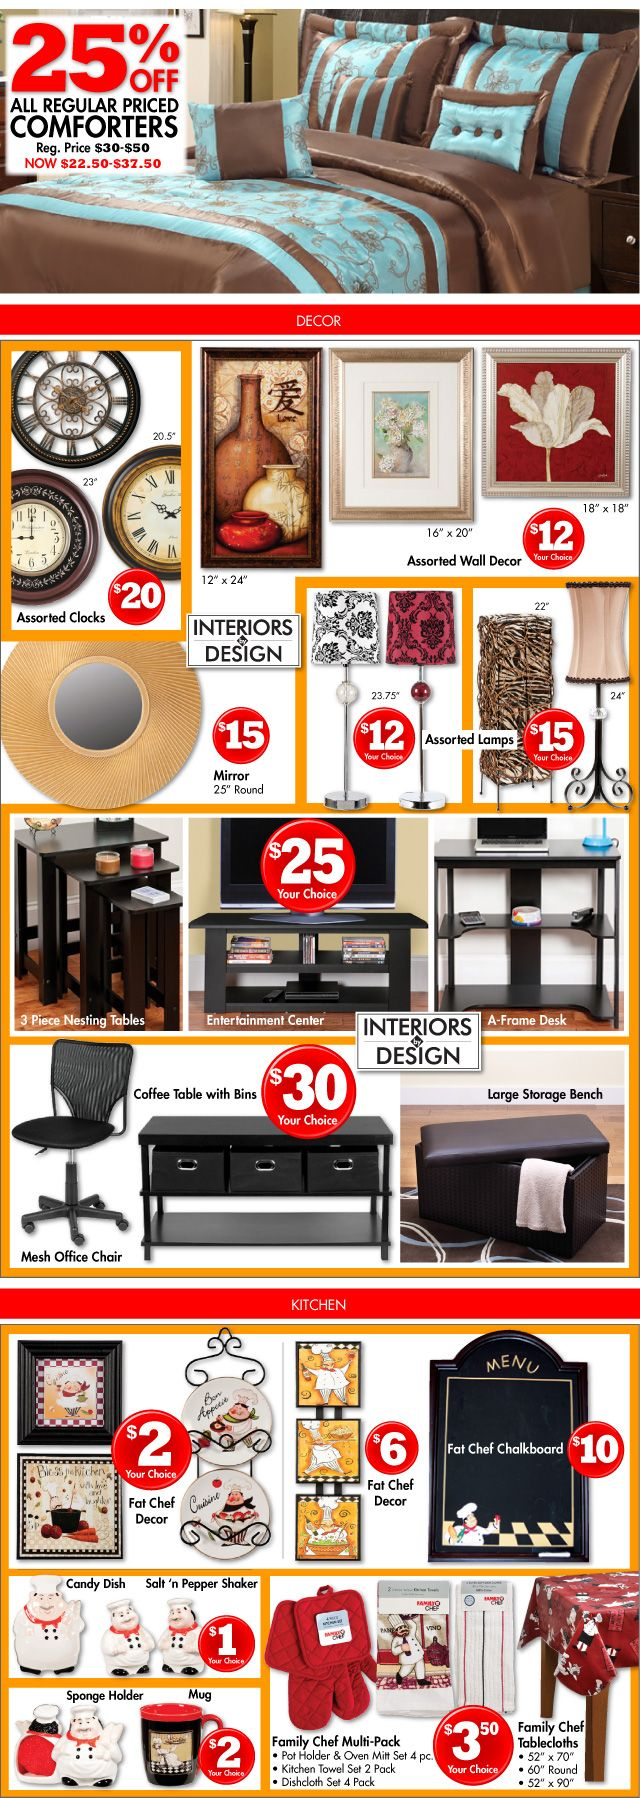 products | discount home decor, decor, dollar store decor